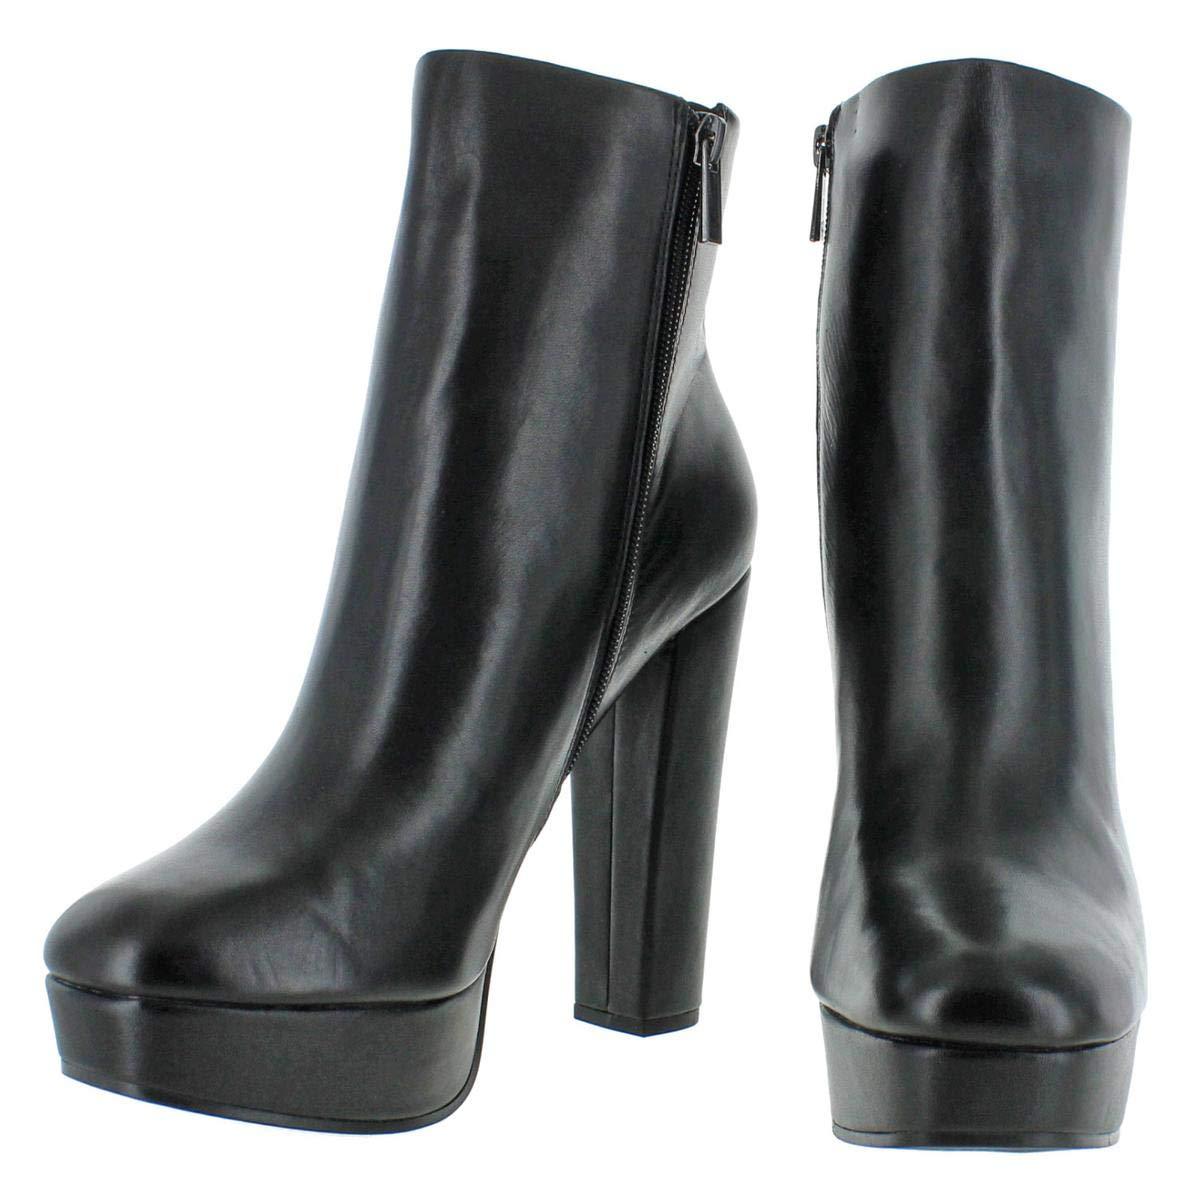 a27f2199764 Amazon.com | Jessica Simpson Women's Sarita Platform Bootie | Ankle ...